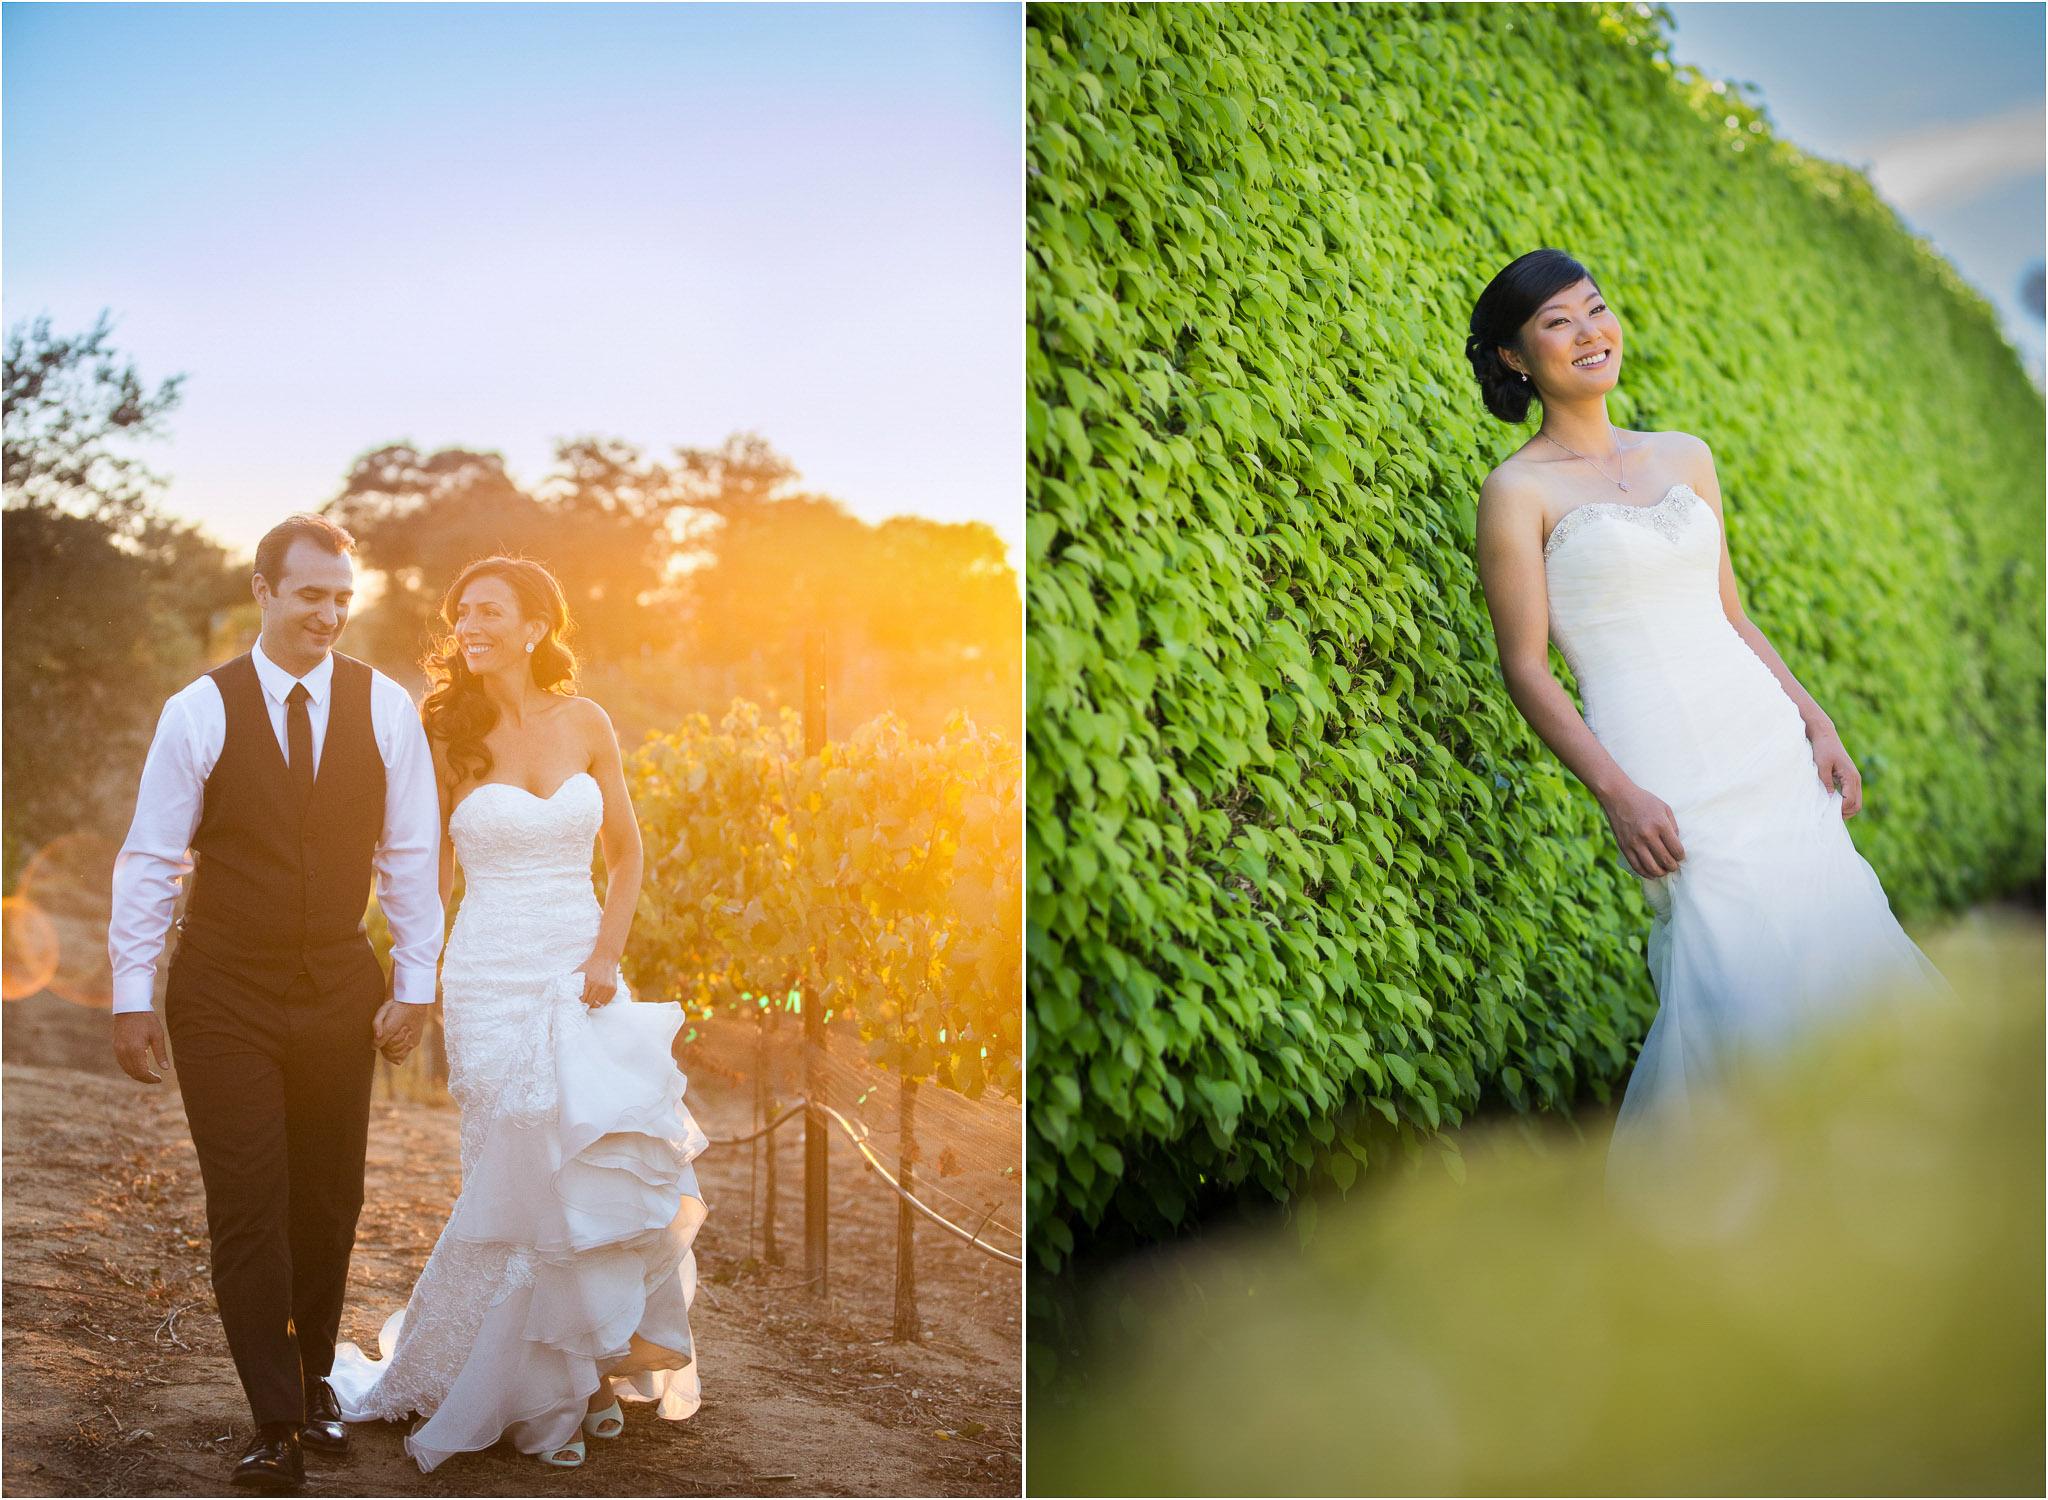 San Diego Wedding Photographer Milagro Farm Vineyards And Winery Ramona Photography Country Rustic Sunset 02